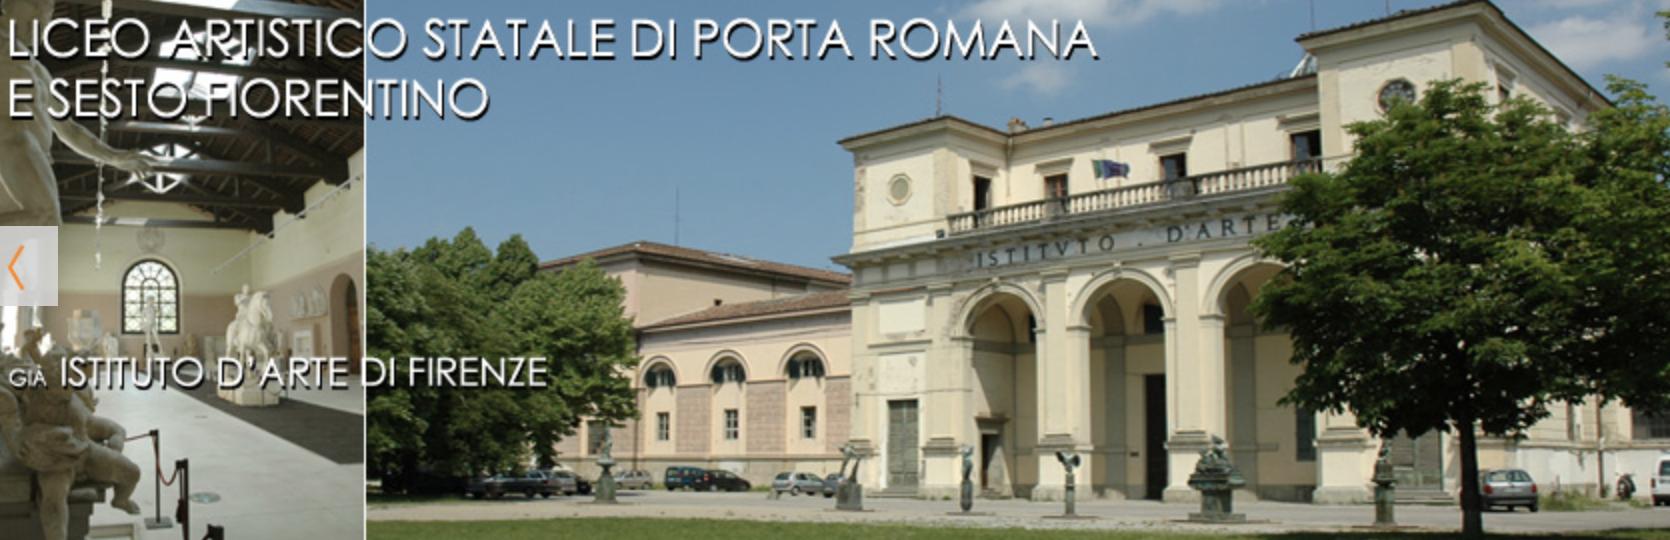 LiceoArtisticoP.ta Romana